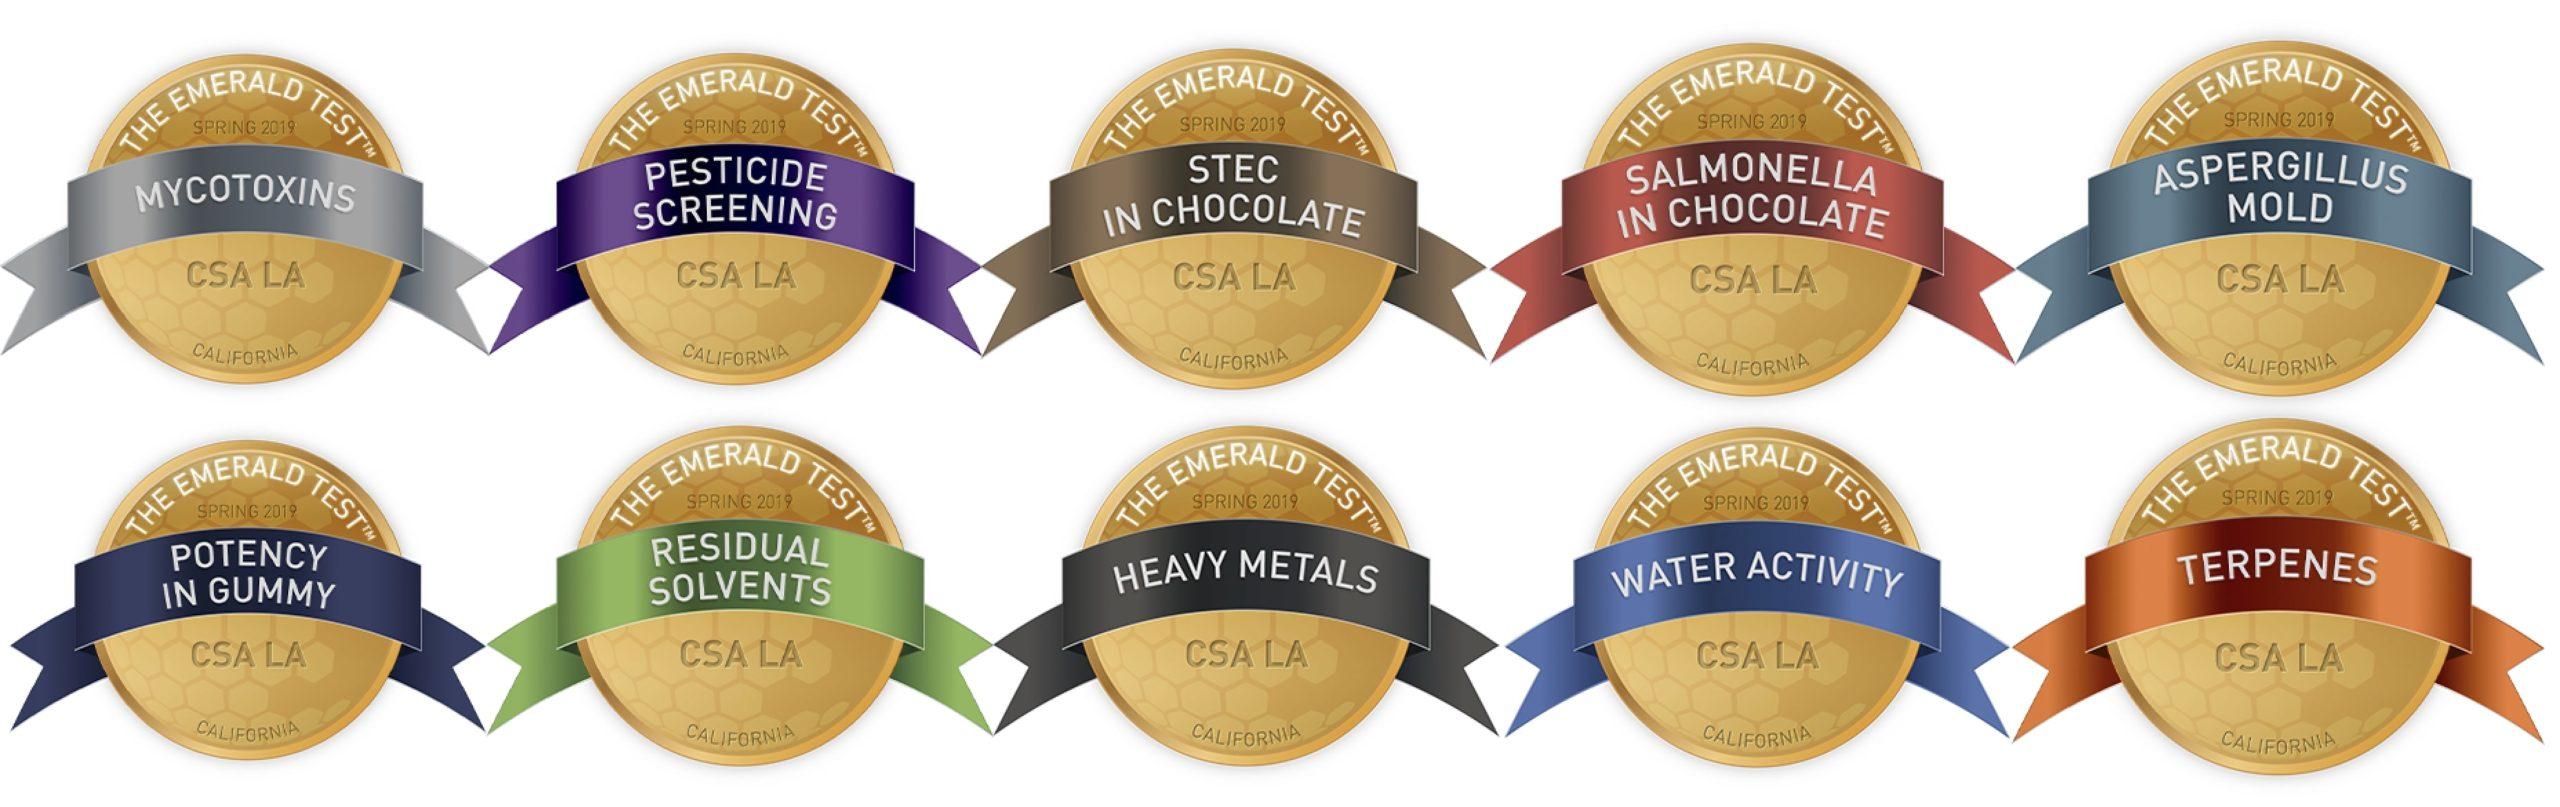 Cannasafe Cannabis Lab Awards